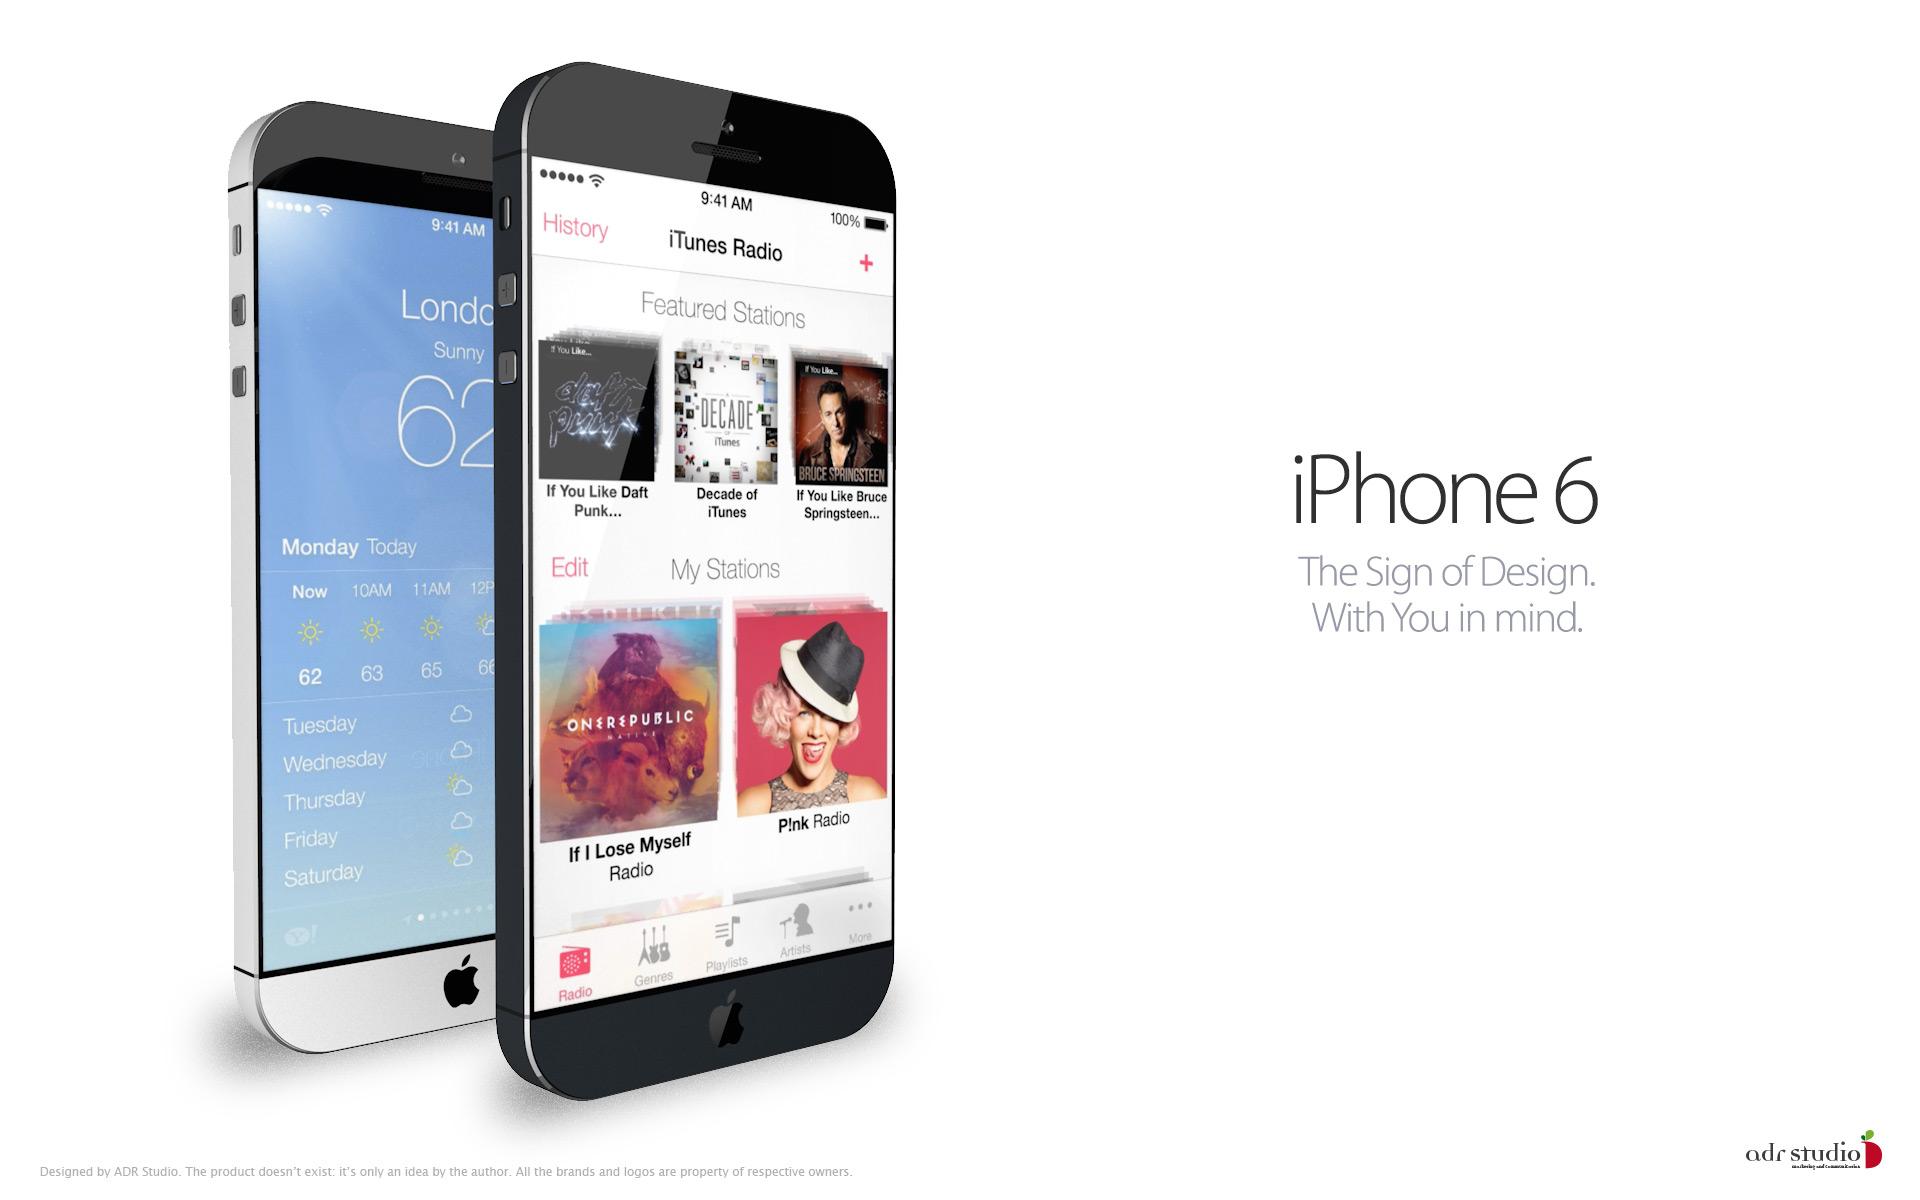 iPad e iPhone 6: secondo i rumors, entrambi dotati di Touch ID